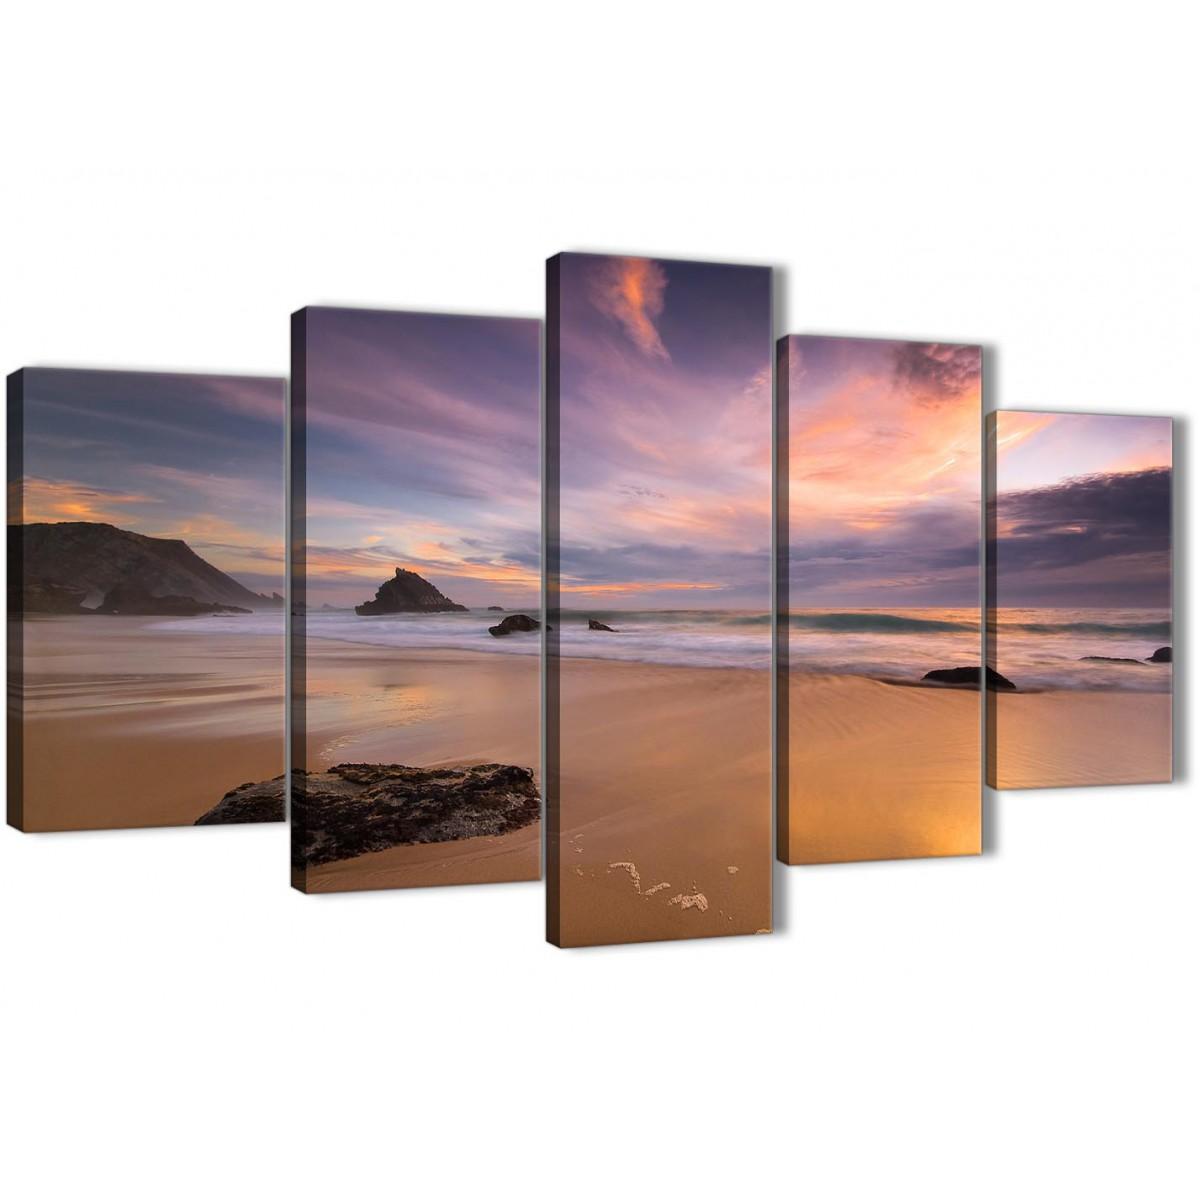 5 Piece Canvas Wall Art Prints Panoramic Landscape Beach